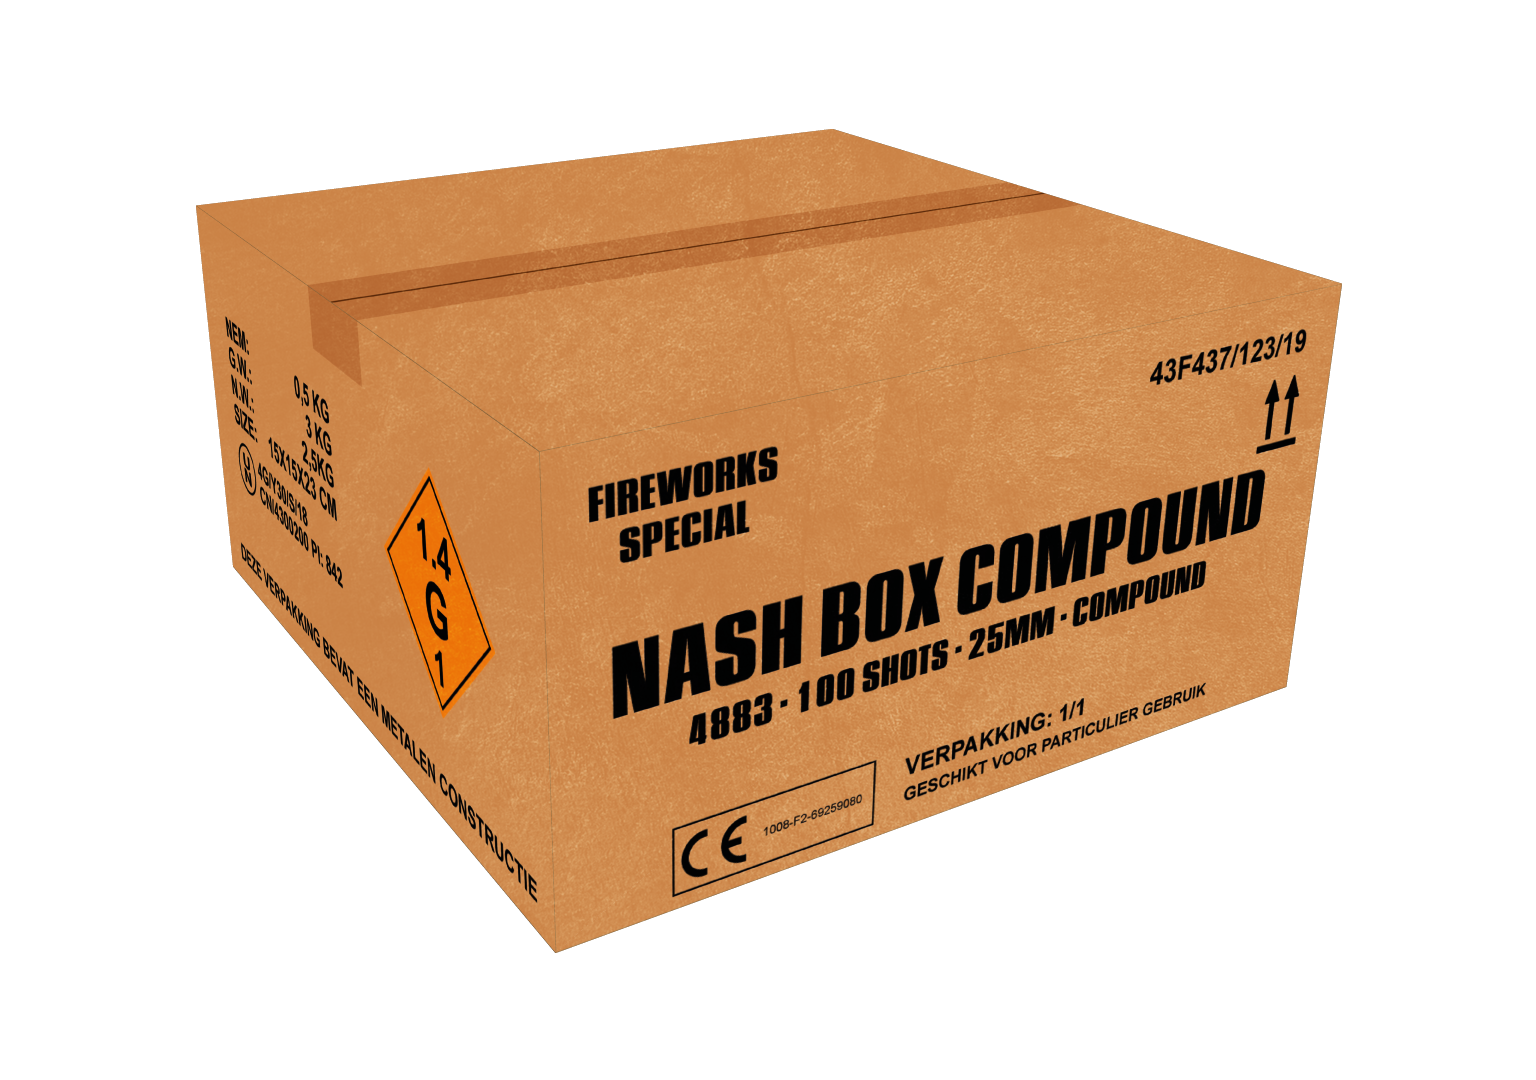 ART. 4883 NASH BOX, 100 SHOTS 30 MM COMPOUND